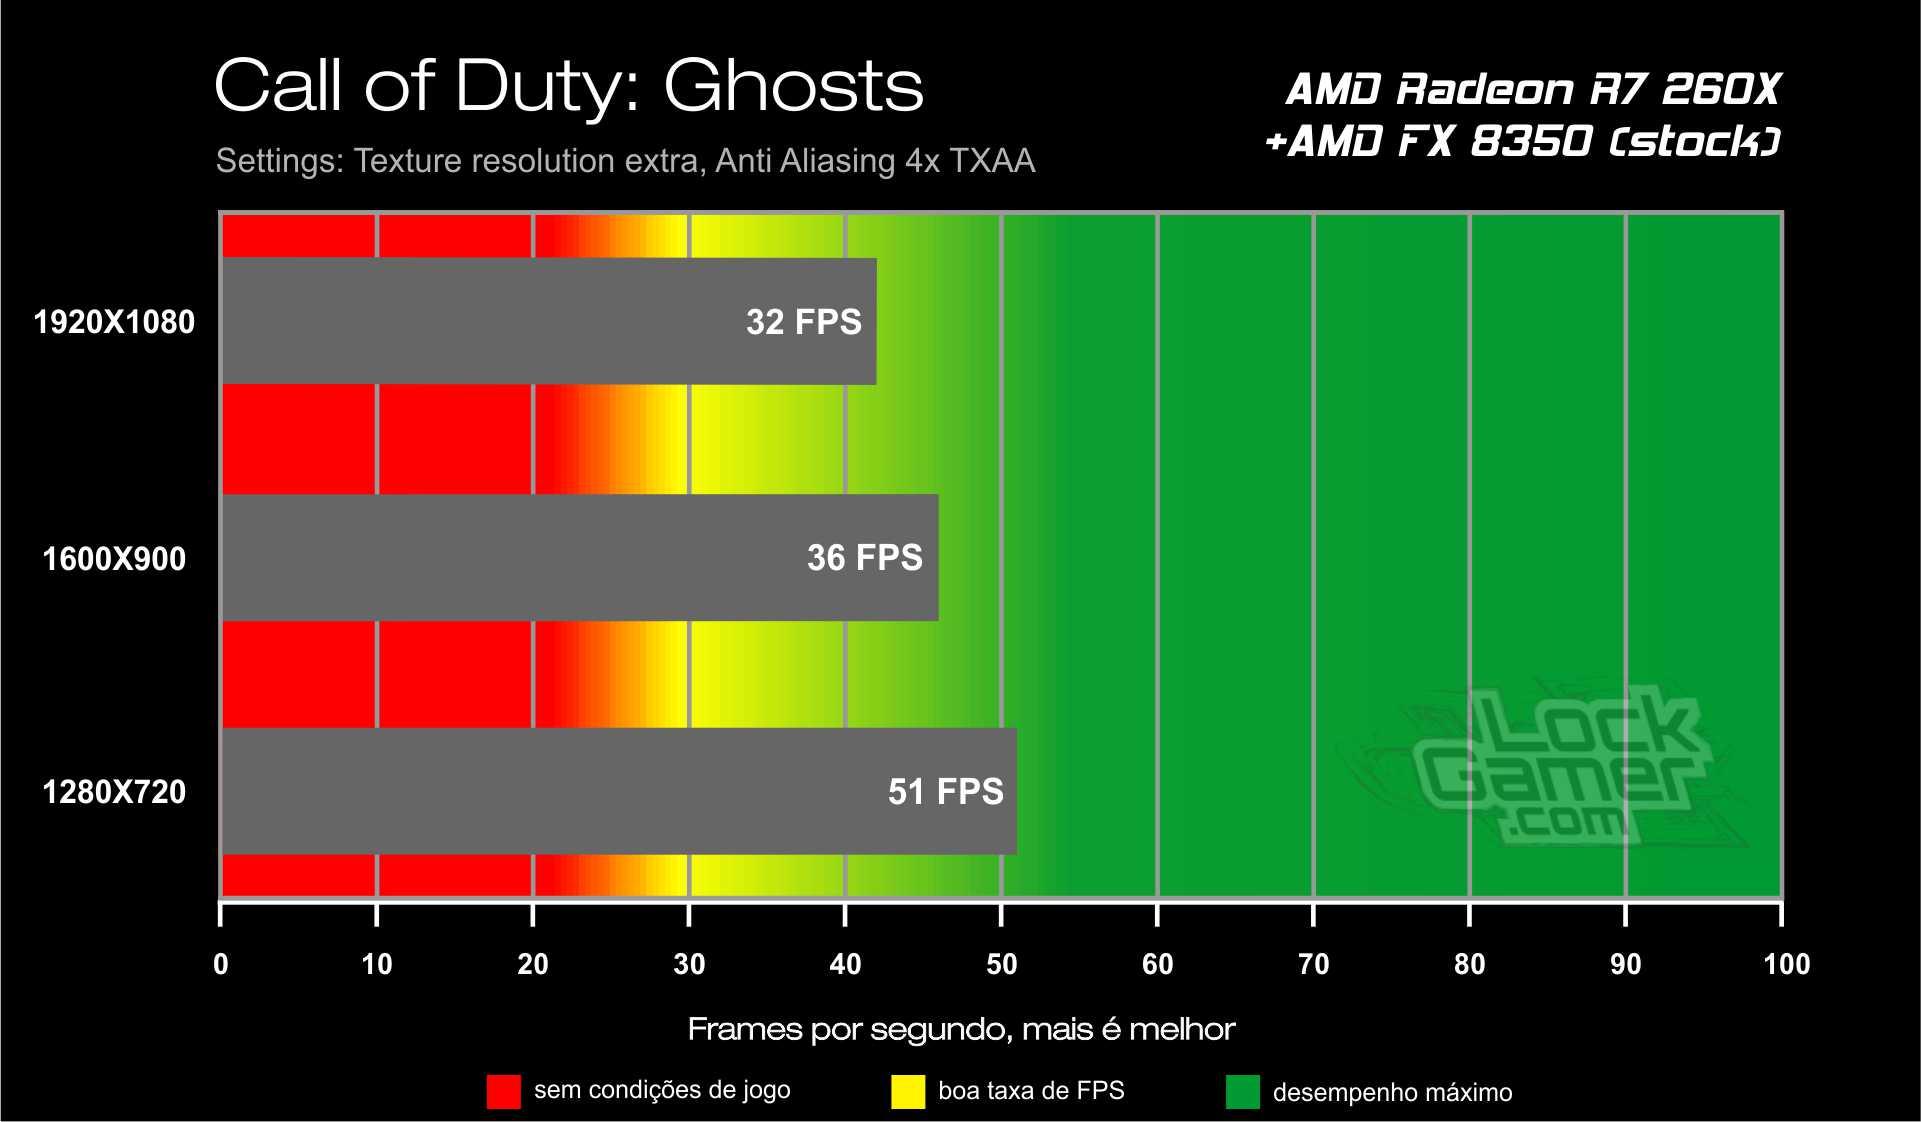 AMD RADEON R7 M260 DRIVERS FOR WINDOWS DOWNLOAD